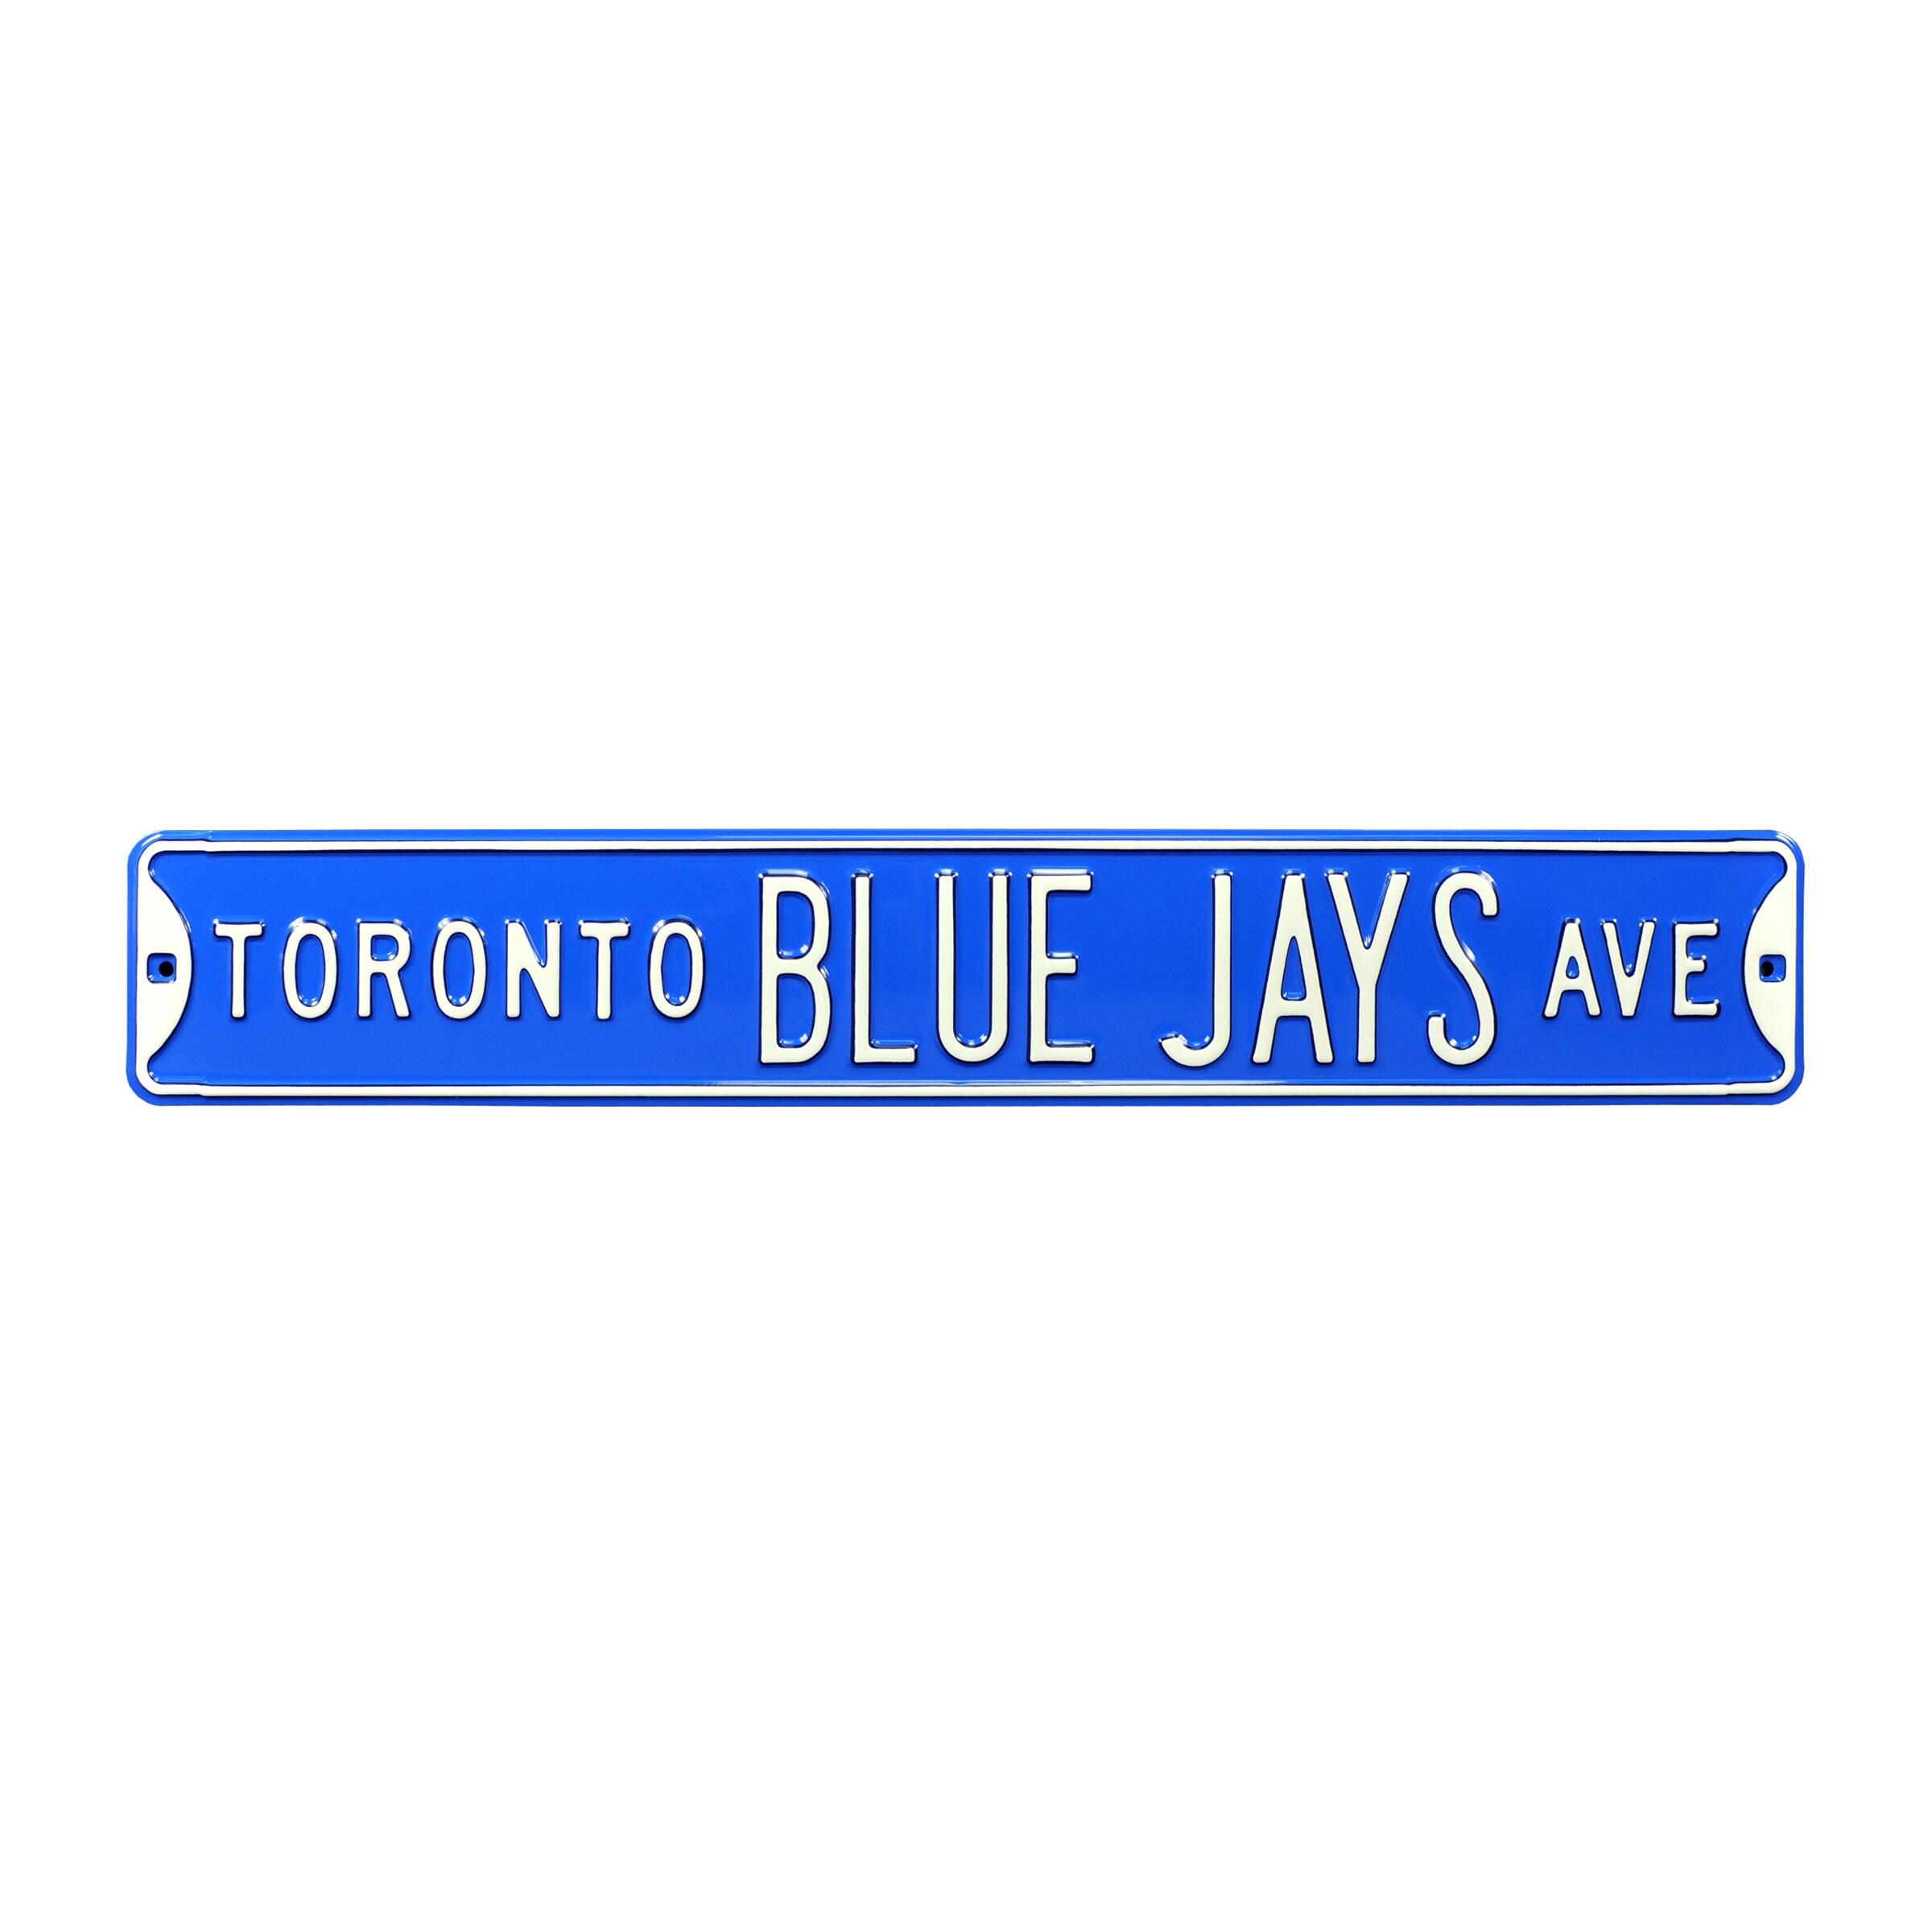 "Toronto Blue Jays 6"" x 36"" Steel Ave Sign Wall Art - Blue"